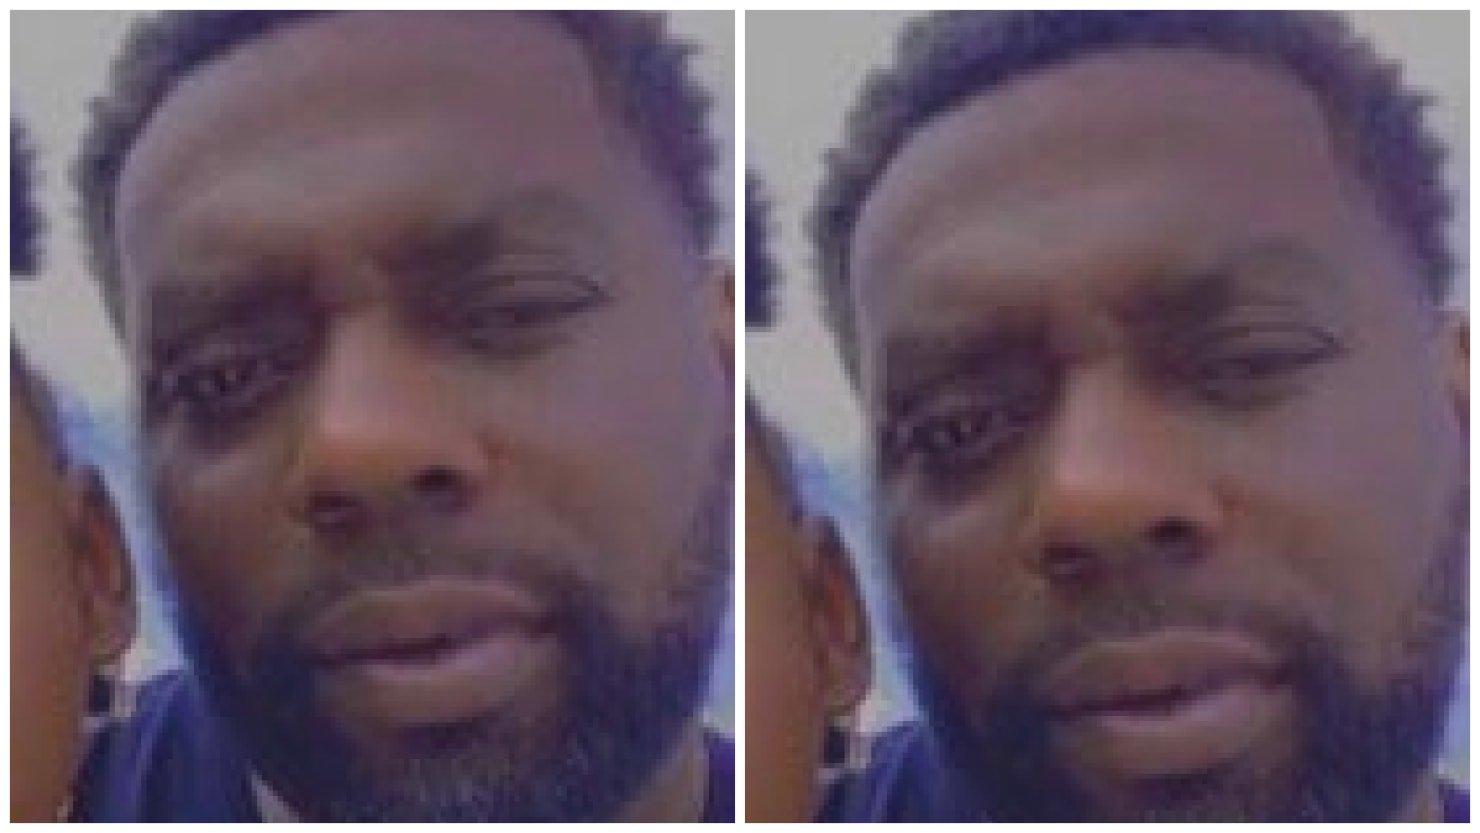 North Carolina Black Man, Andrew Brown Jr., Fatally Shot by Deputy Serving a Search Warrant